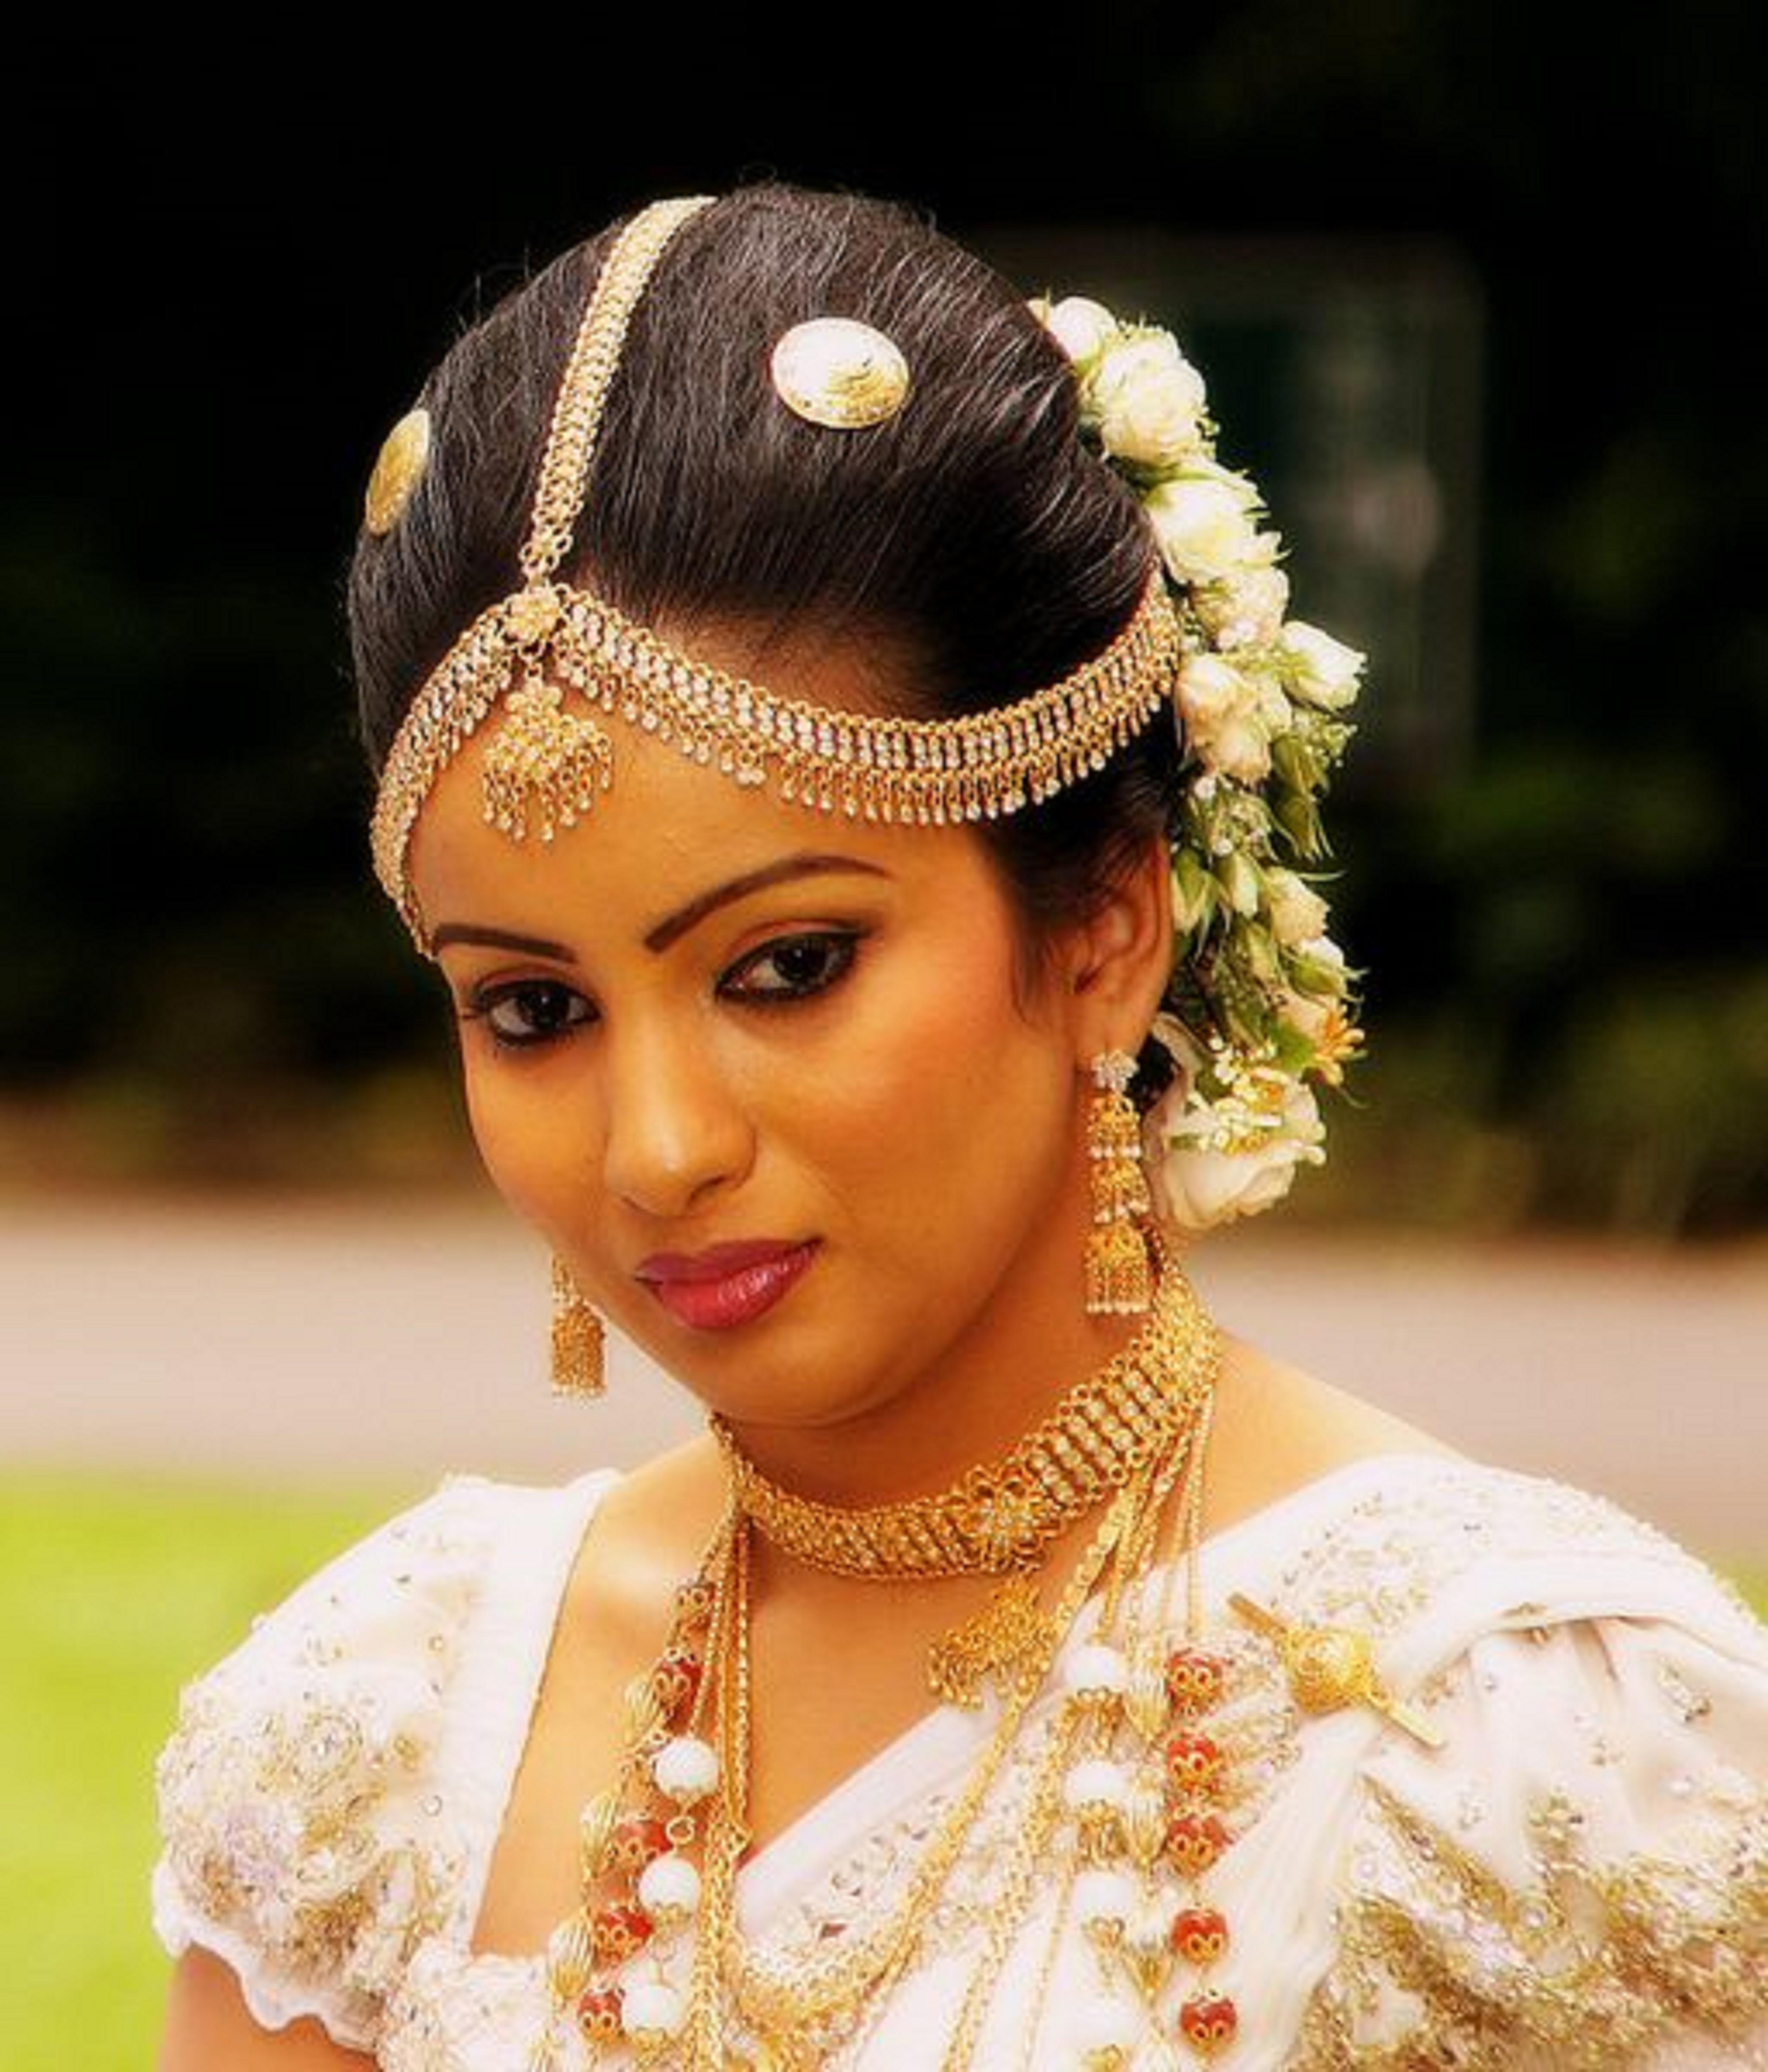 Wedding Hairstyle In Sri Lanka: File:Bride In Sri Lanka Kandy.jpg